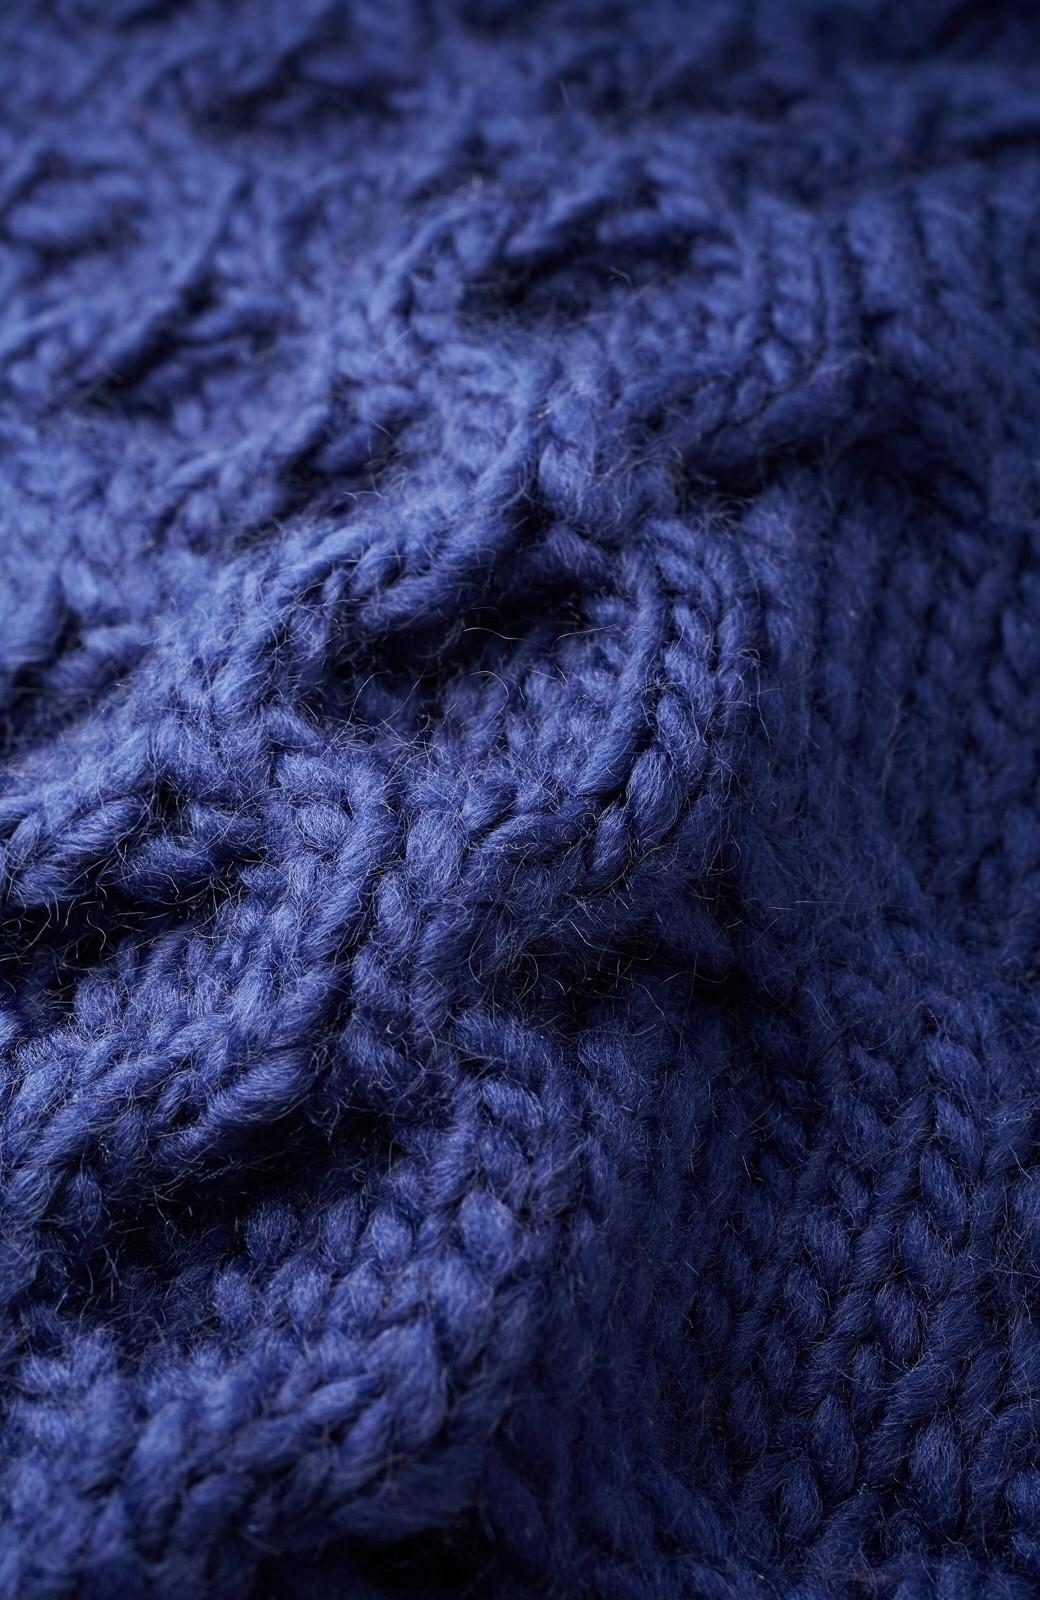 haco! 古着っぽい雰囲気がこなれたパネル編みケーブルニット <ネイビー>の商品写真3